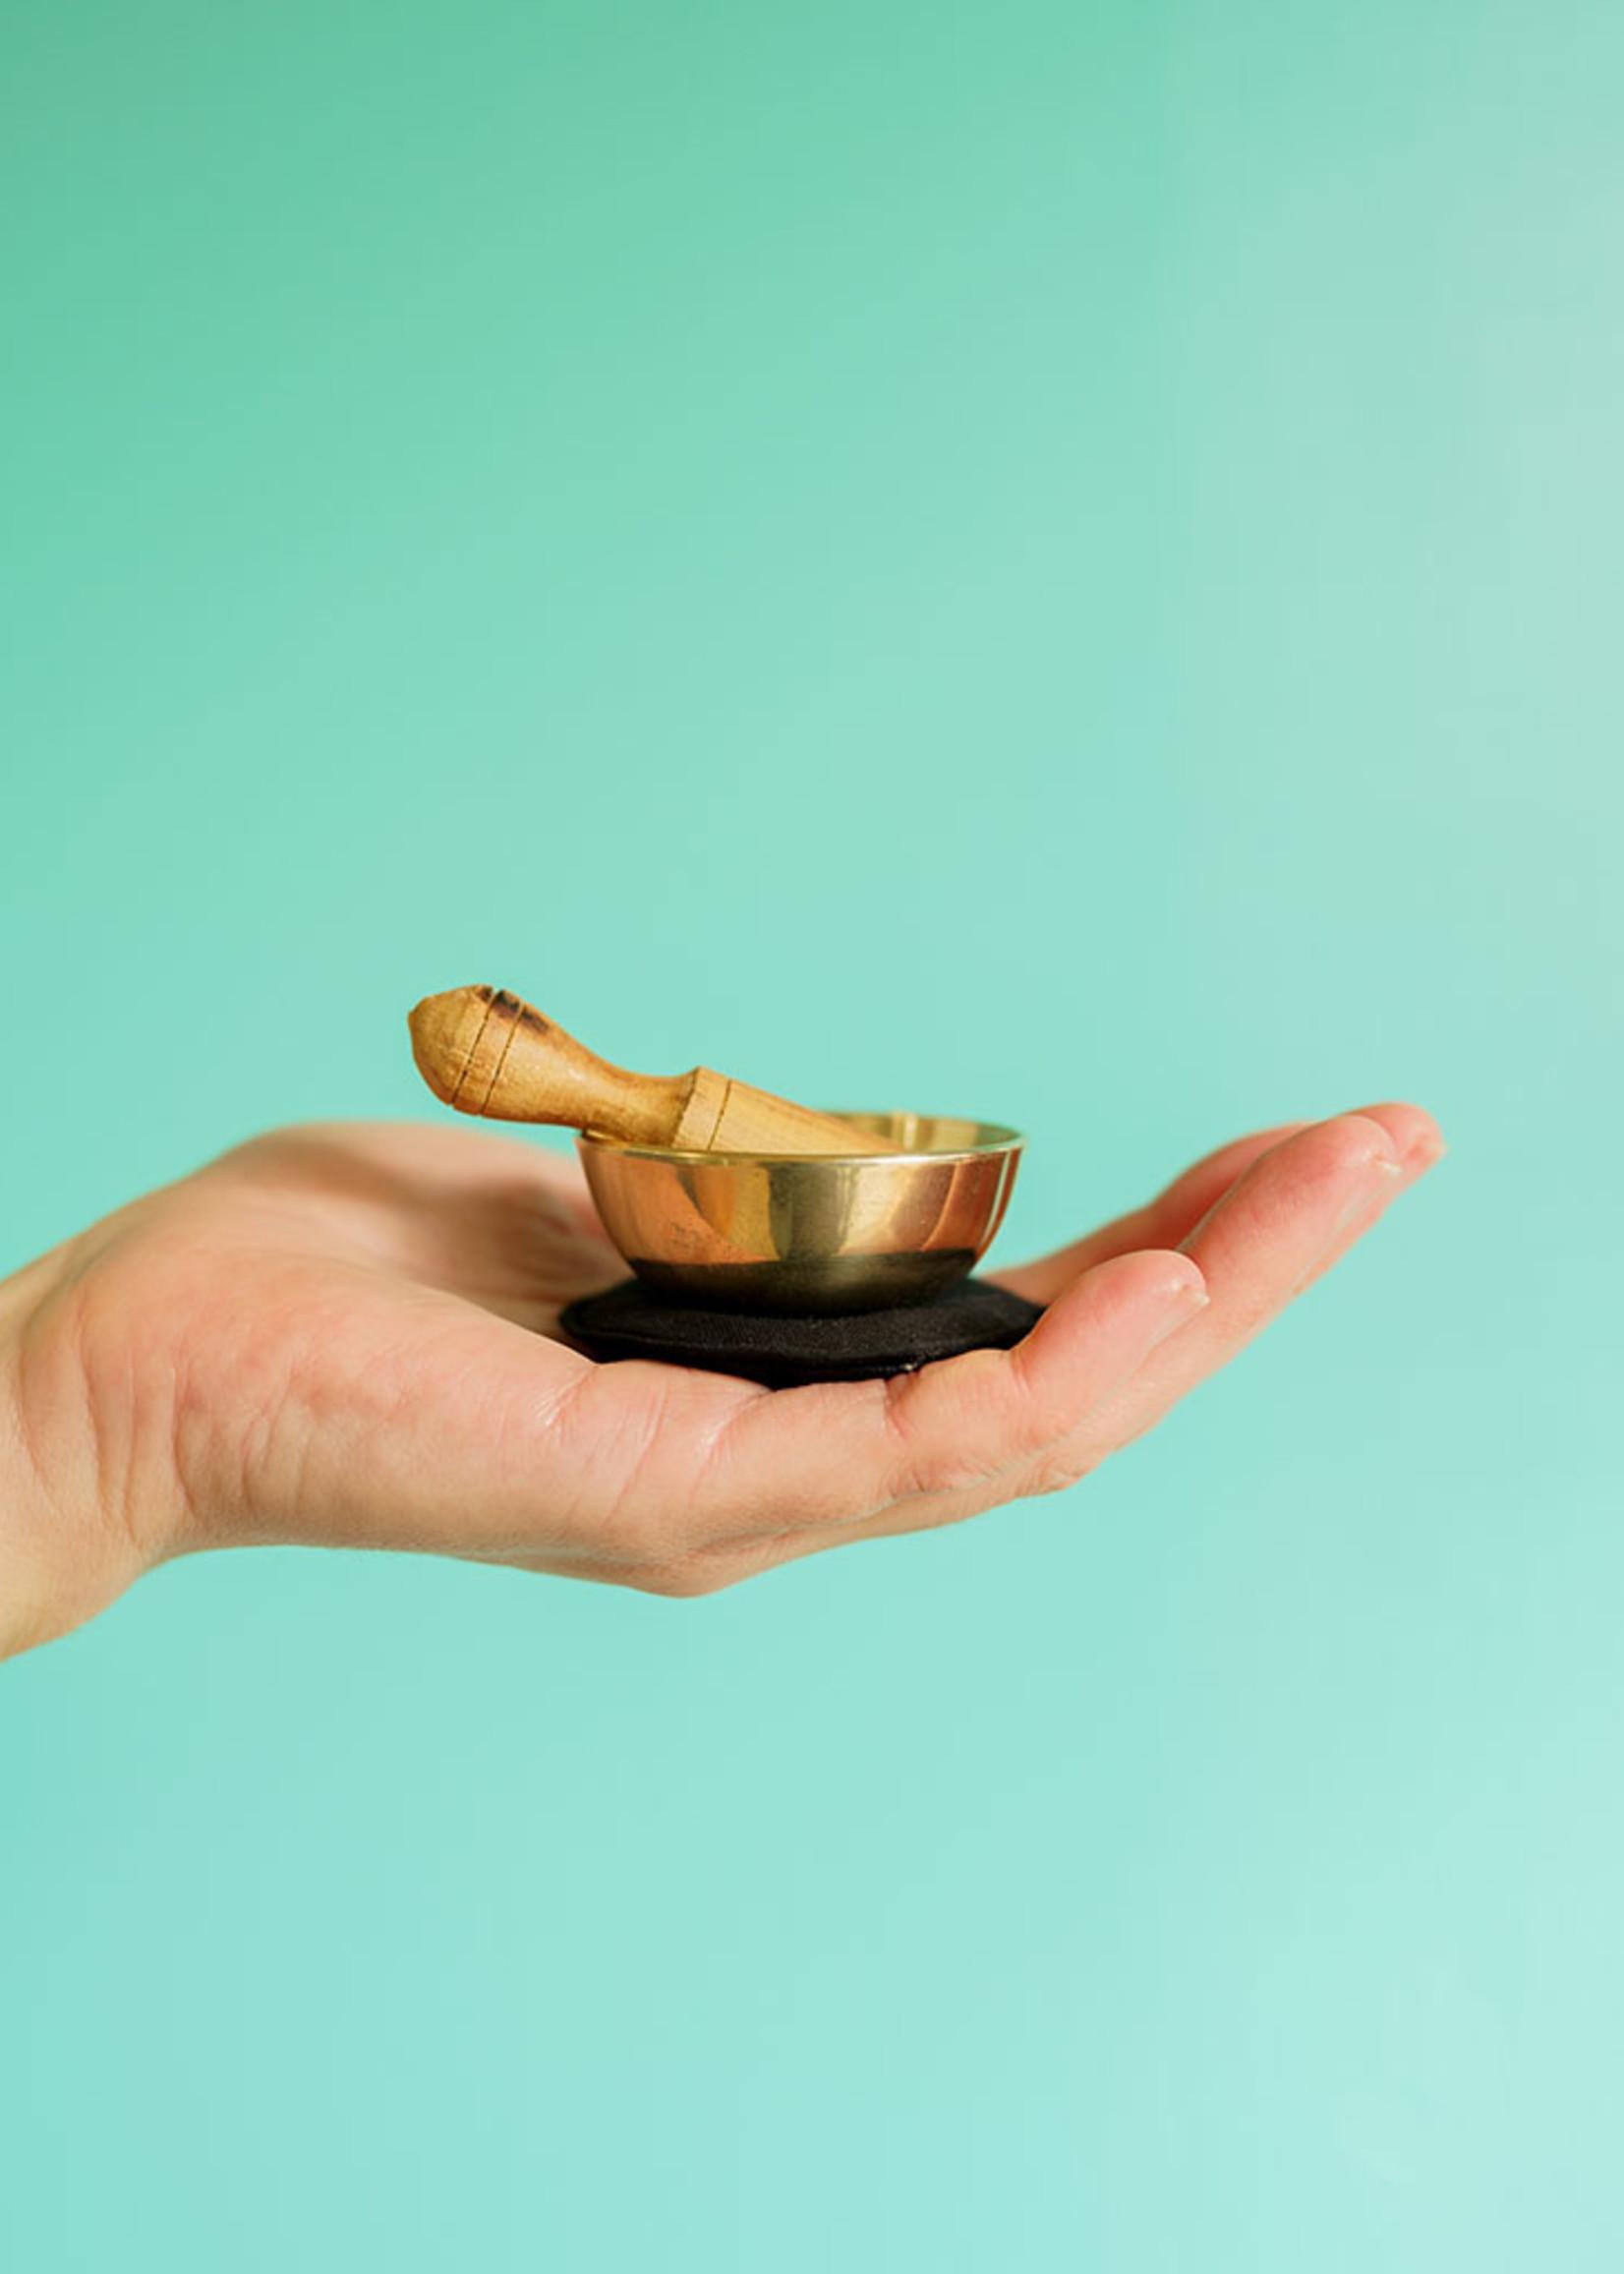 dZi Dark Blue Third Eye Chakra Mini Meditation Bowl